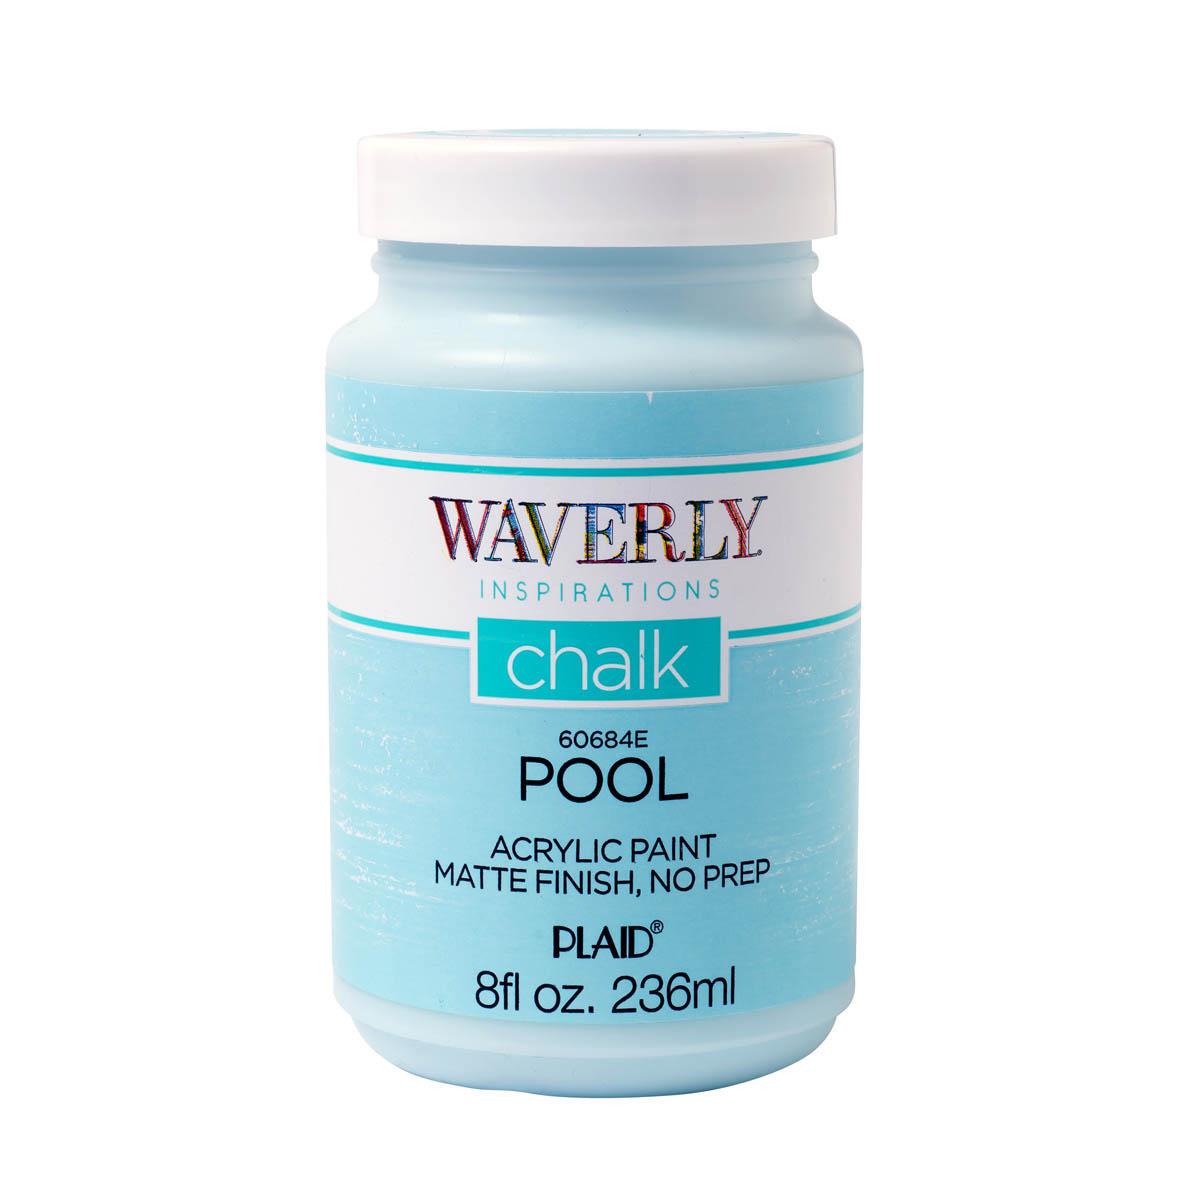 Waverly ® Inspirations Chalk Acrylic Paint - Pool, 8 oz.